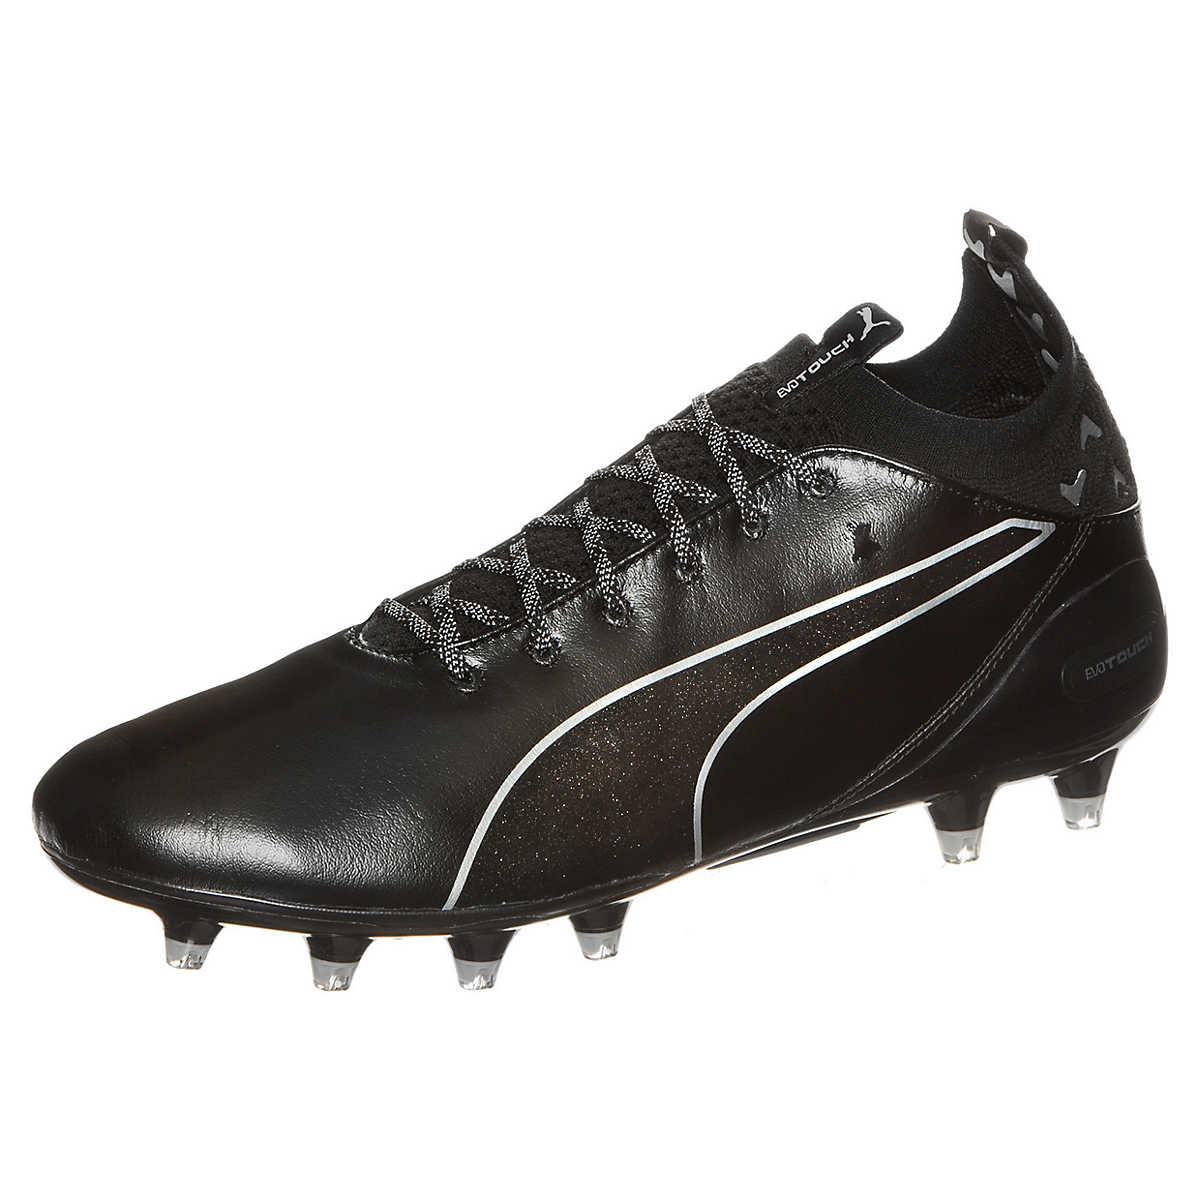 Puma evoTOUCH Pro FG FuÃ?Â?ballschuhe schwarz - PUMA - Sportschuhe - Schuhe - mirapodo.de